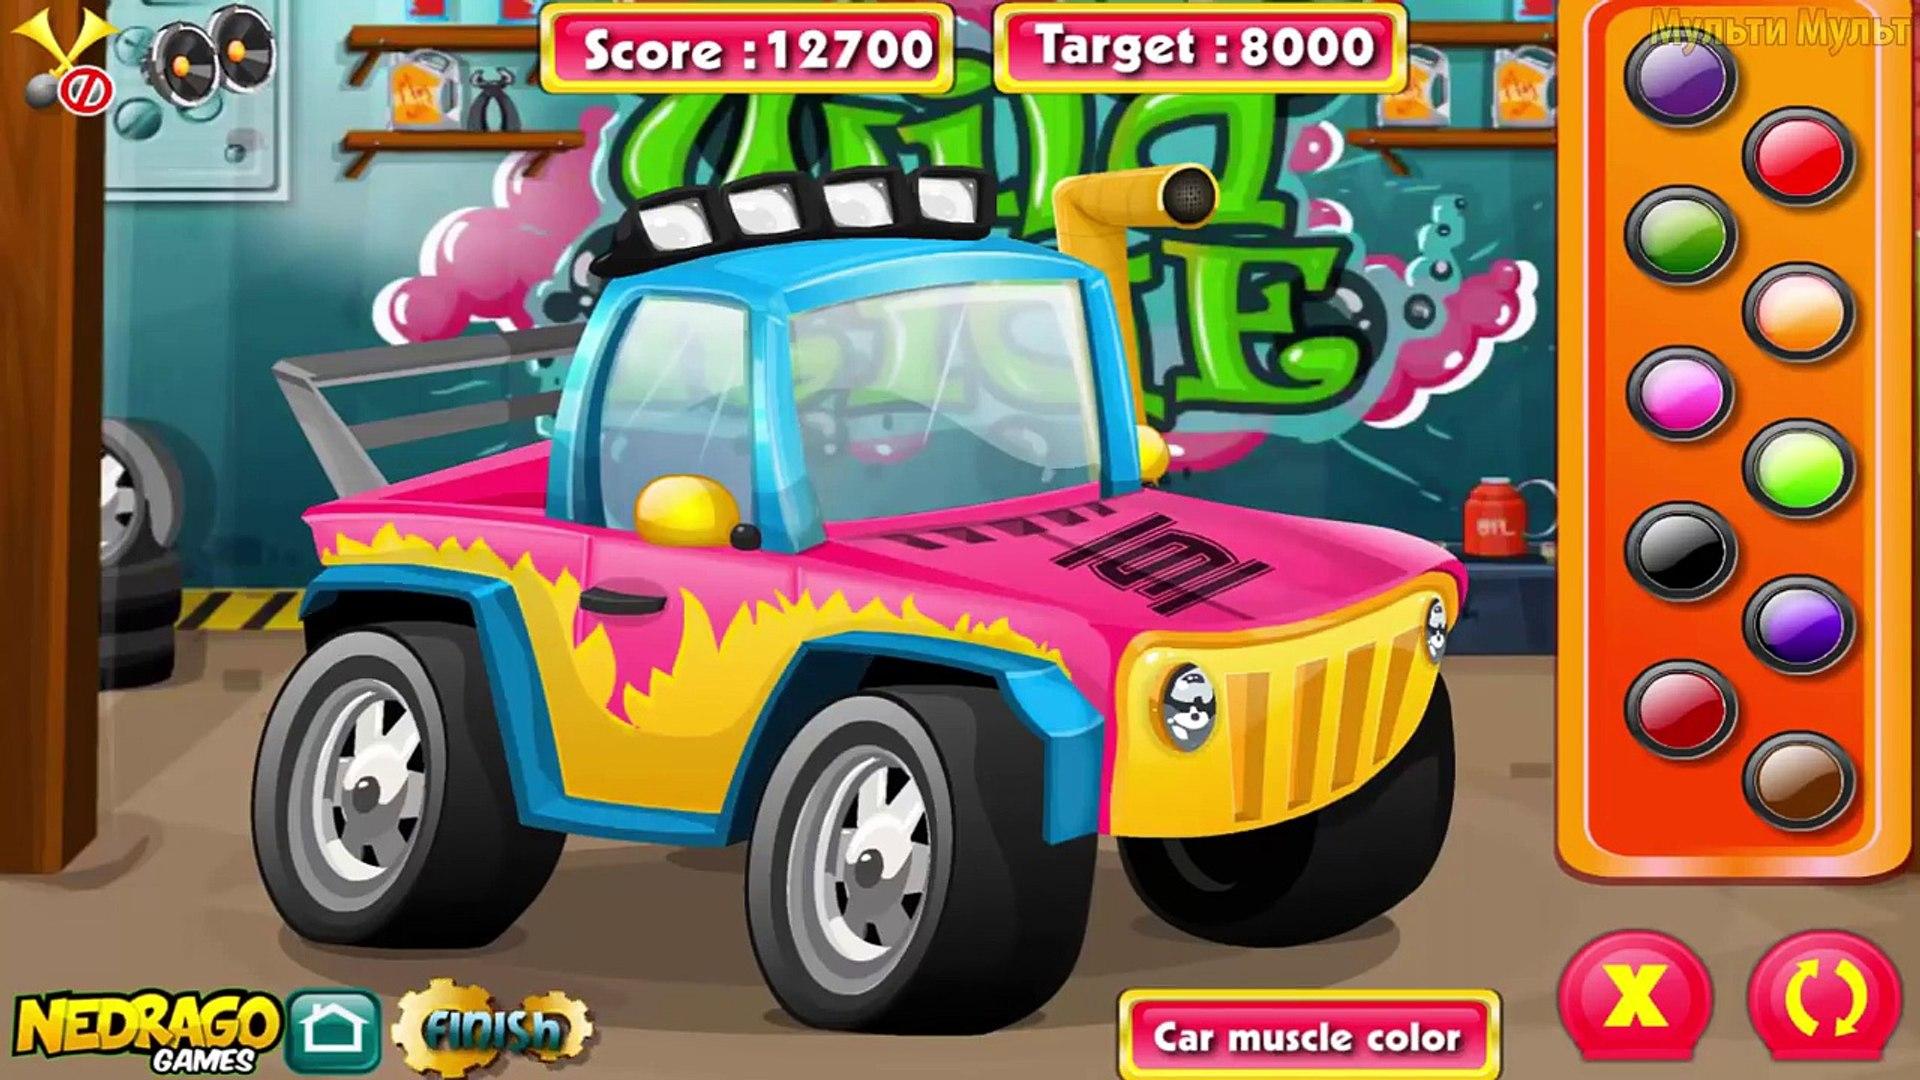 Sports Car Factory   Videos for Kids   Videos For Children   Garage Repair Sport Car for Kids Game